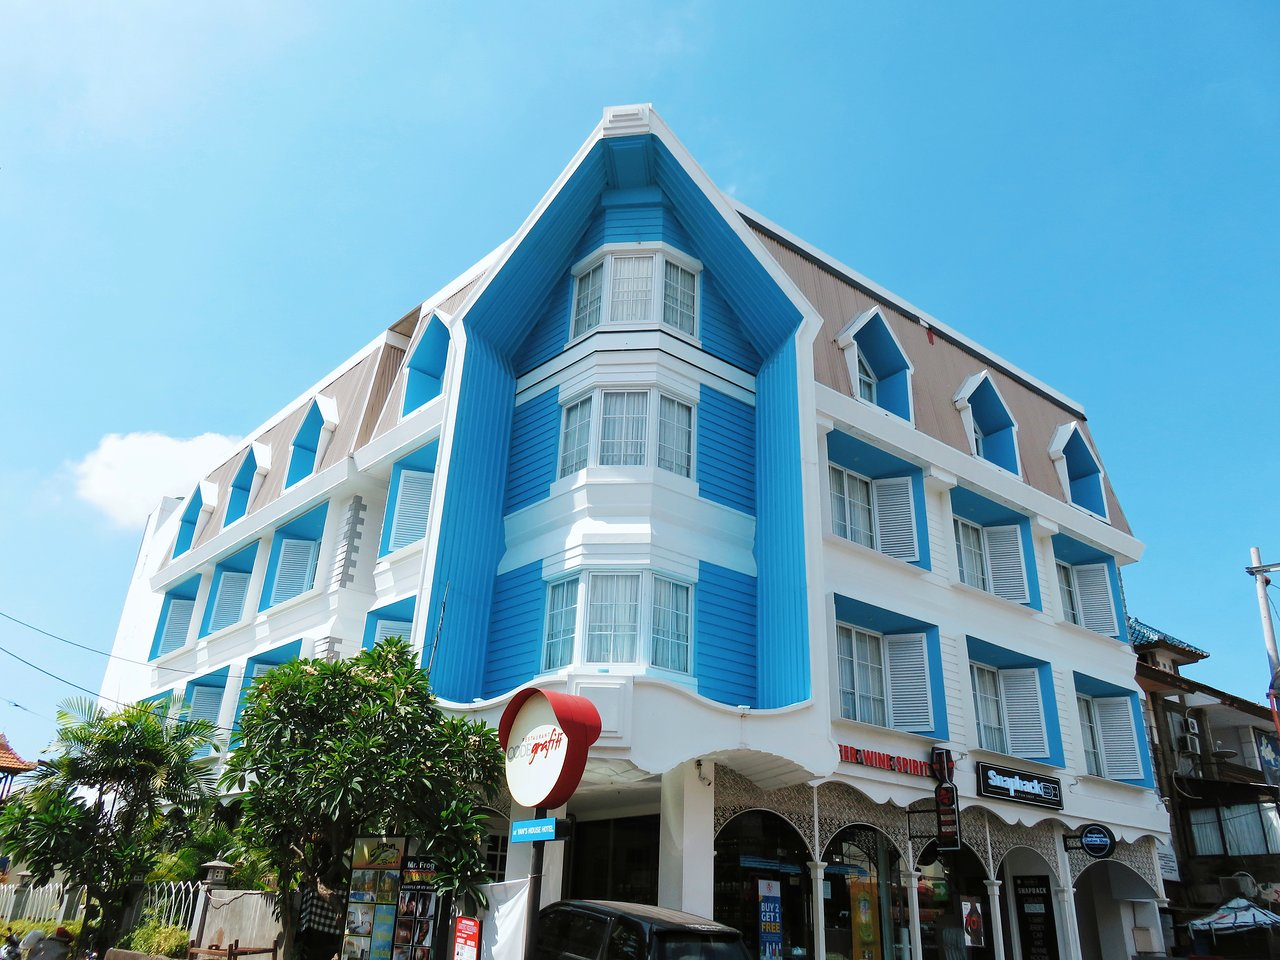 Yans House Hotel Au59 Au66 2018 Prices Reviews Bali Voucer Best Western Resort Kuta Photos Of Tripadvisor